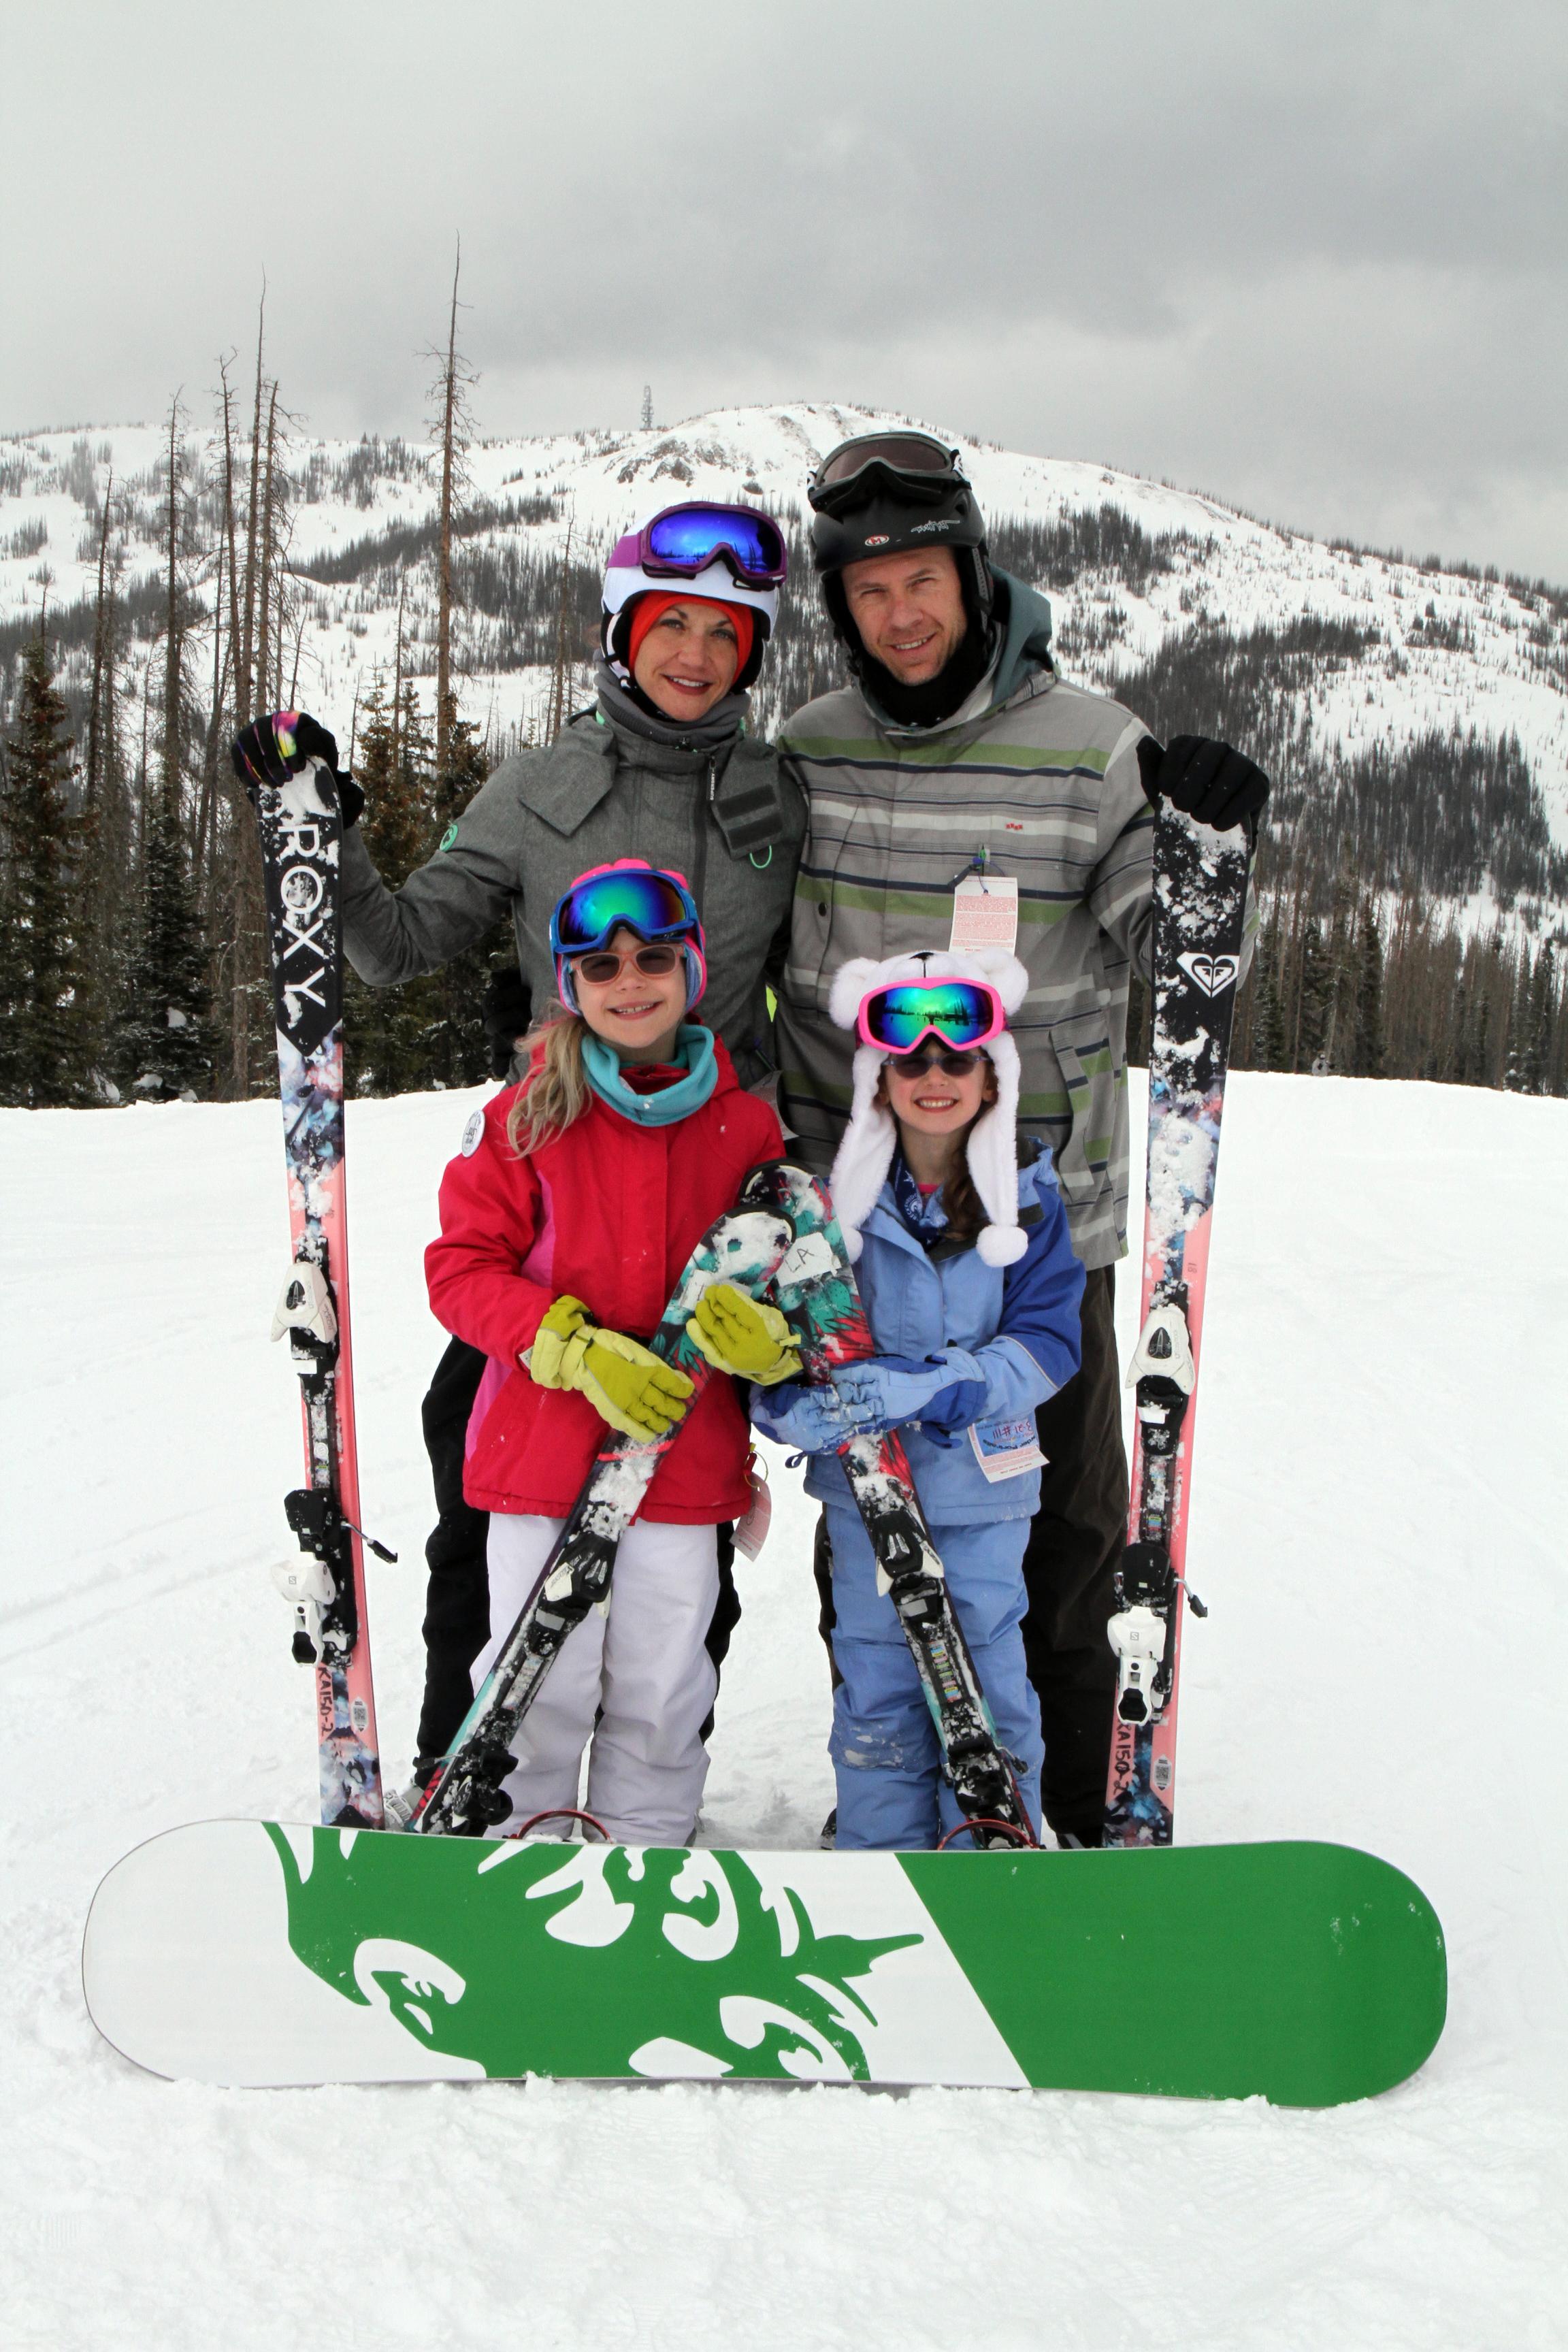 Andersen family ski photo, on the slopes